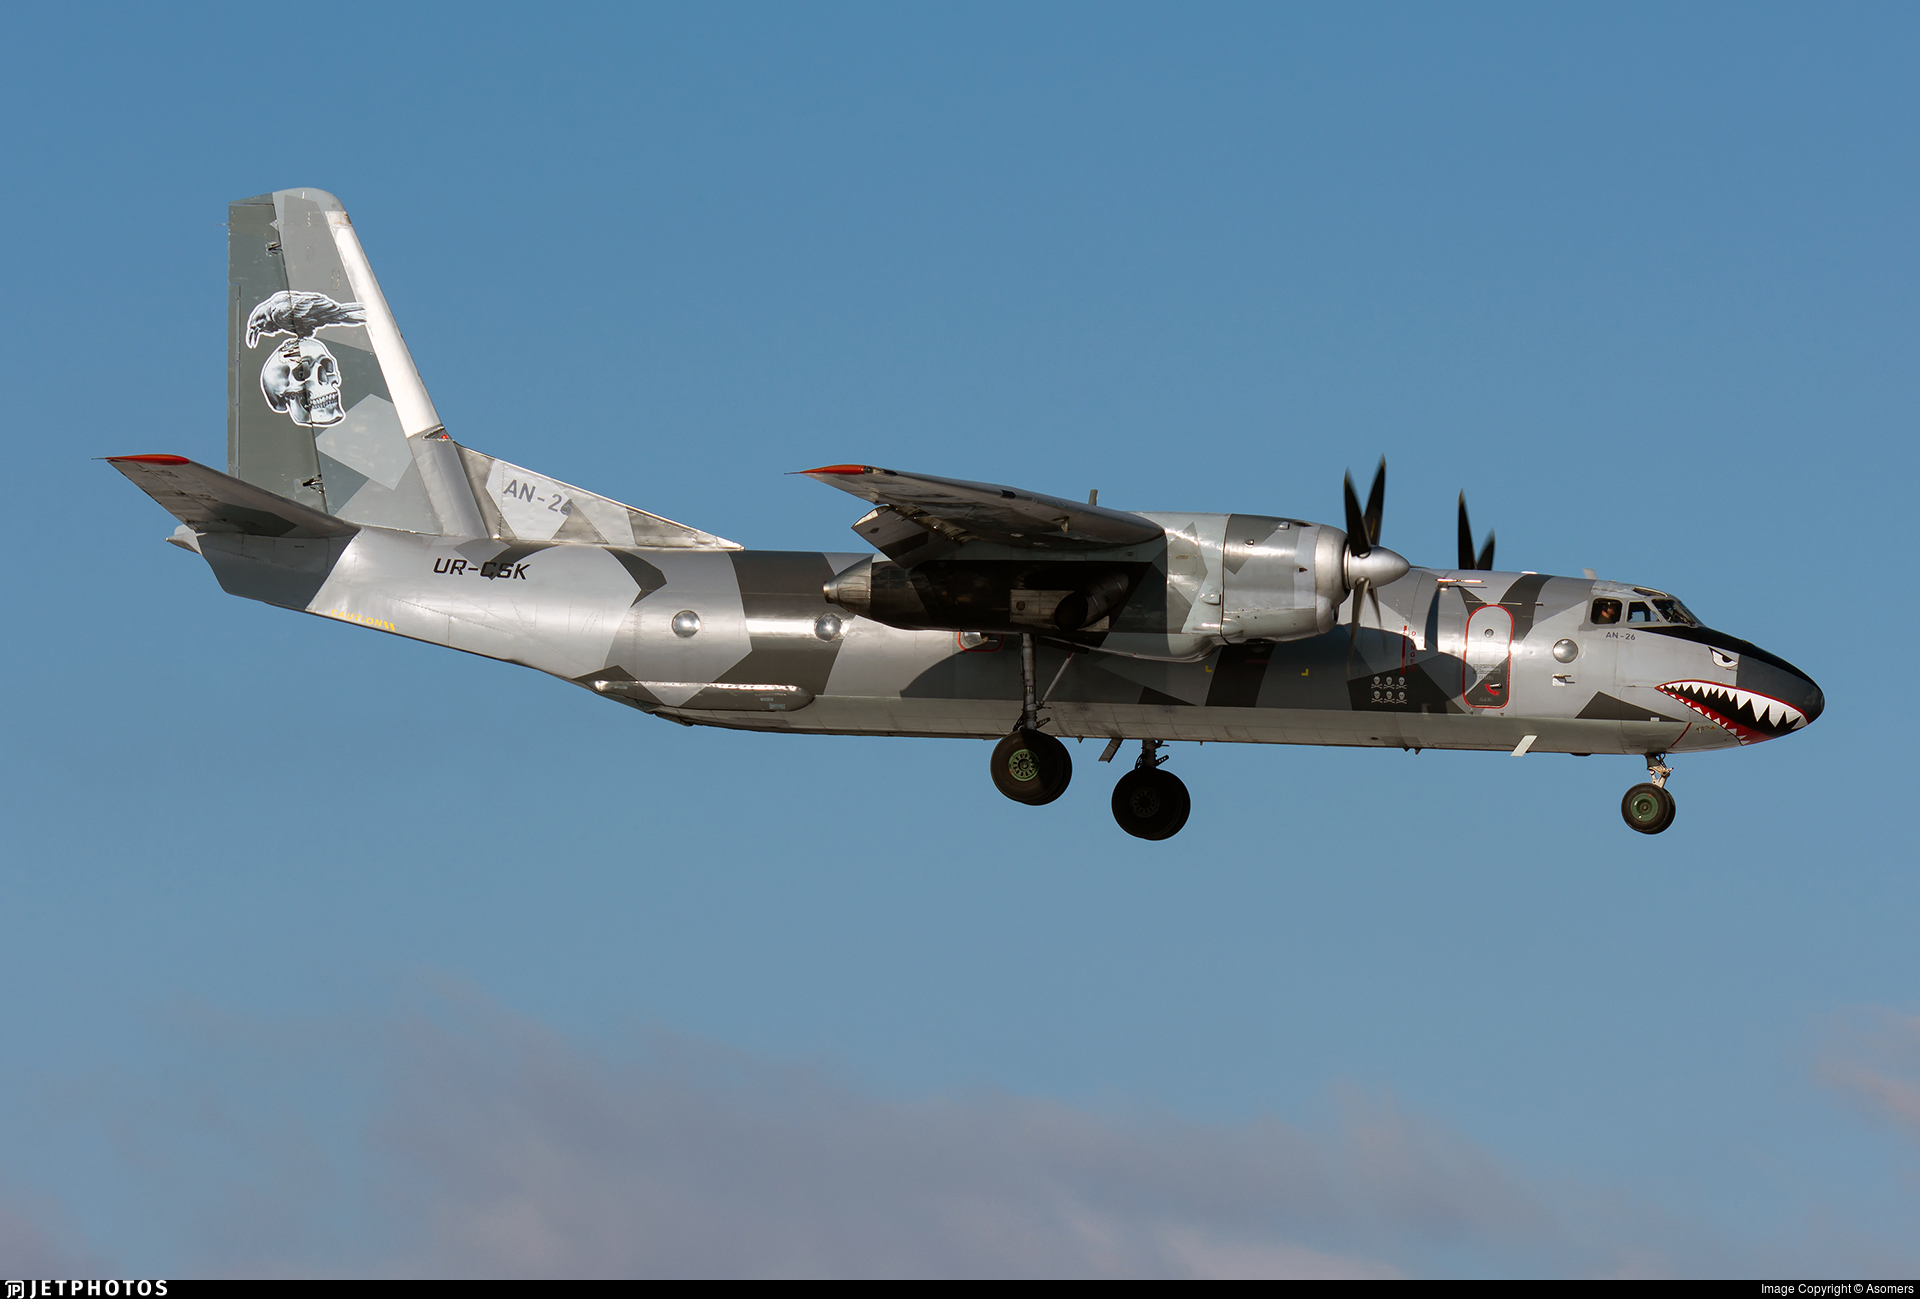 UR-CSK - Antonov An-26B - Eleron